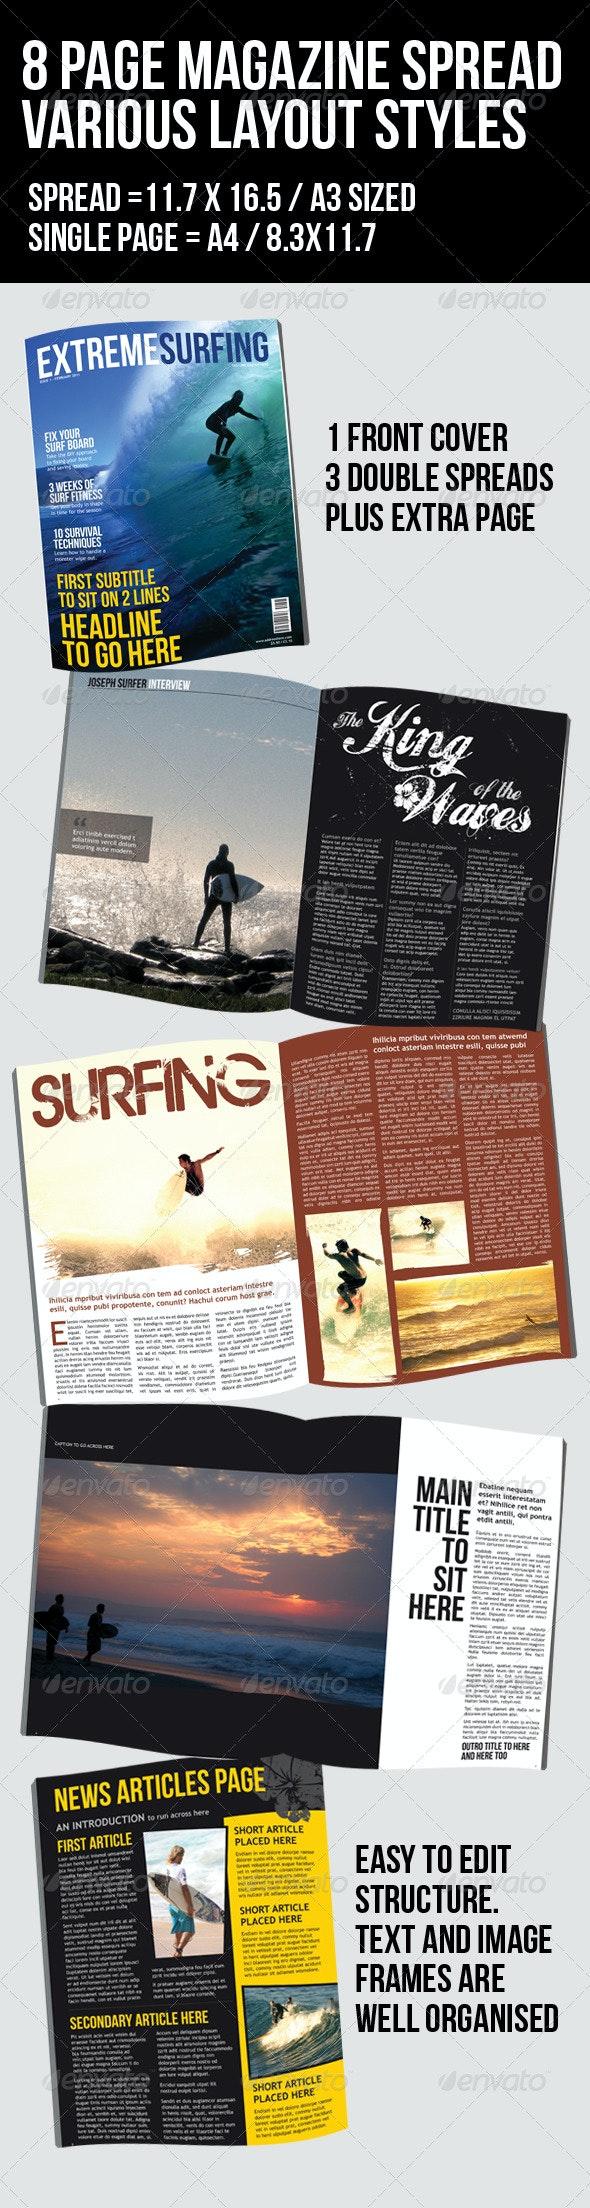 Surfing Magazine - 8 page - 4 layouts - Magazines Print Templates